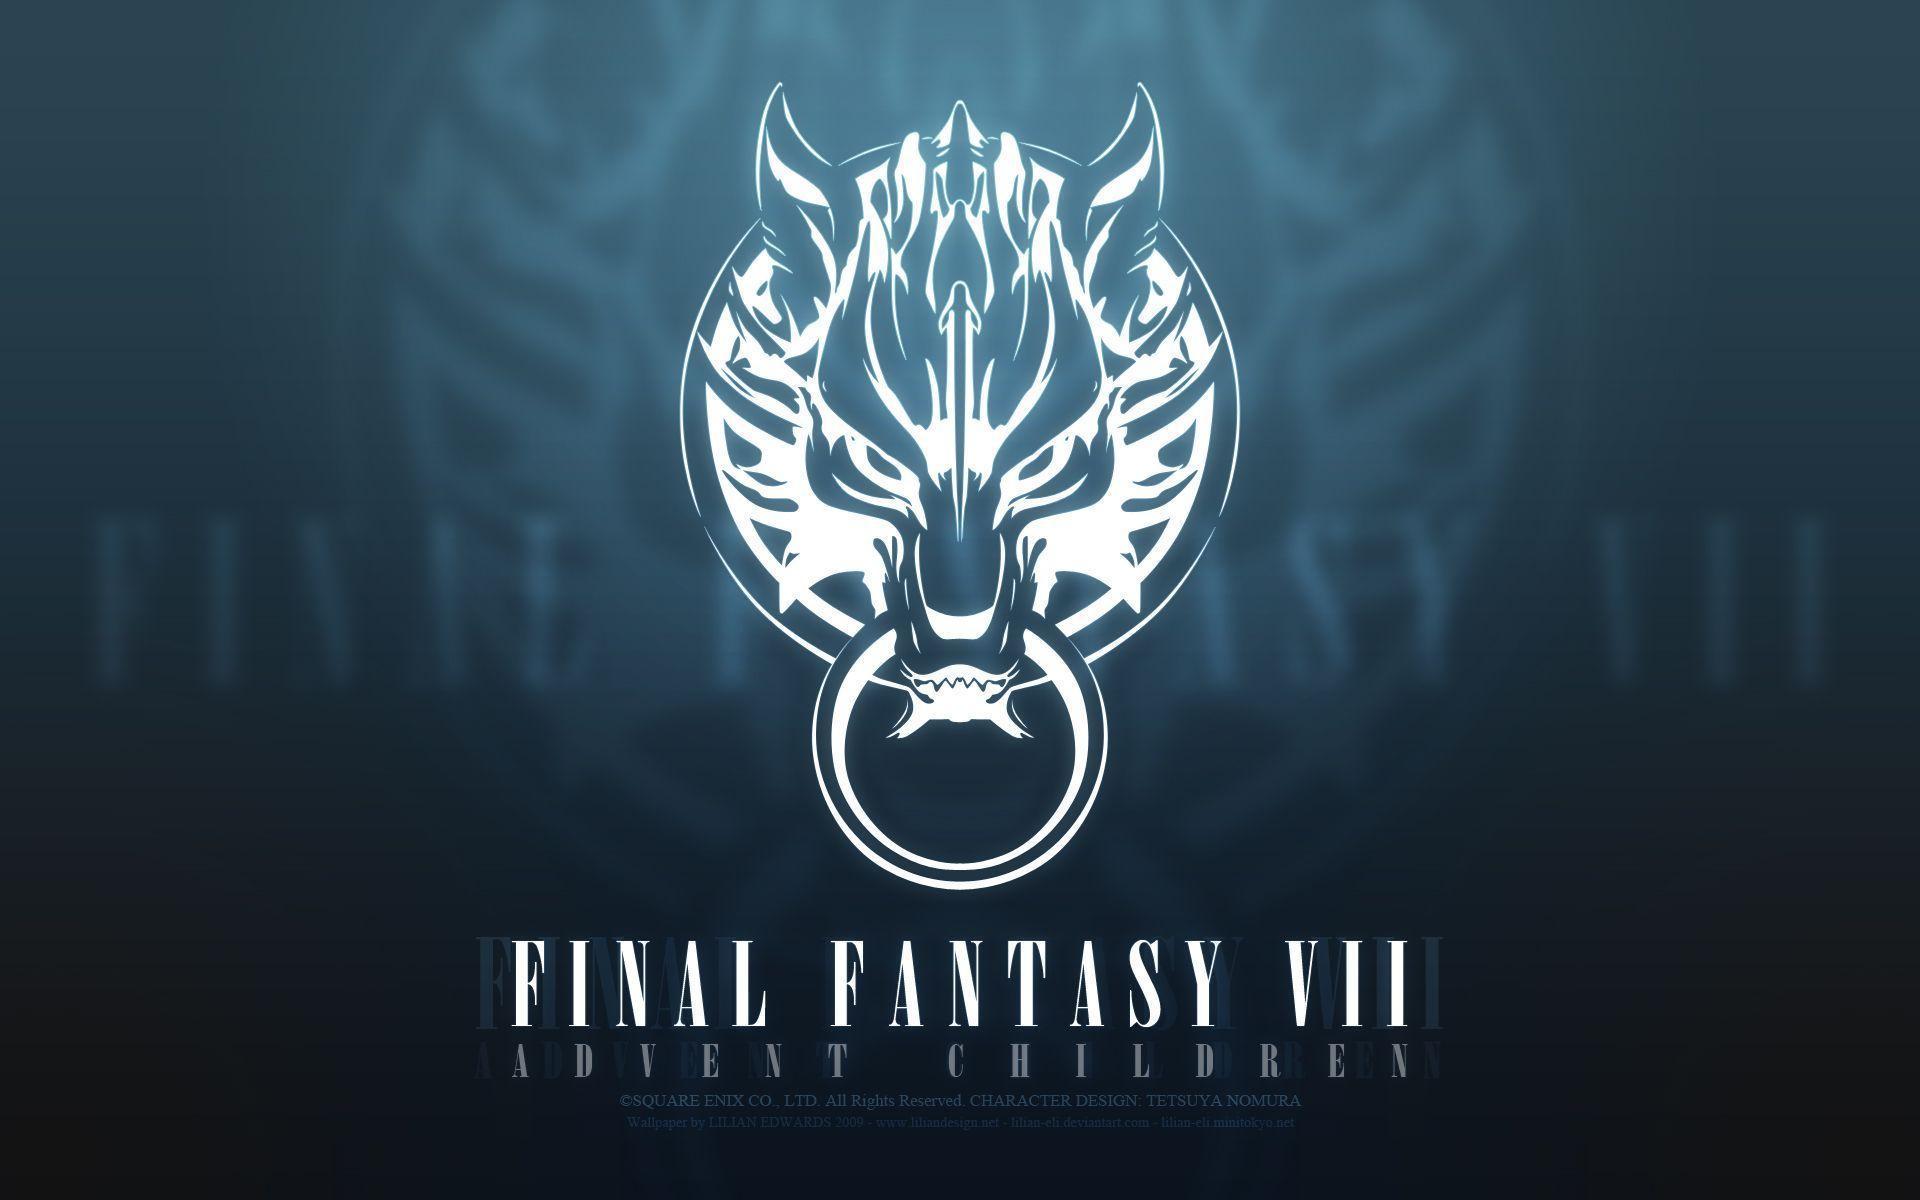 Final Fantasy 7 Advent Children Wallpapers Wallpaper Cave